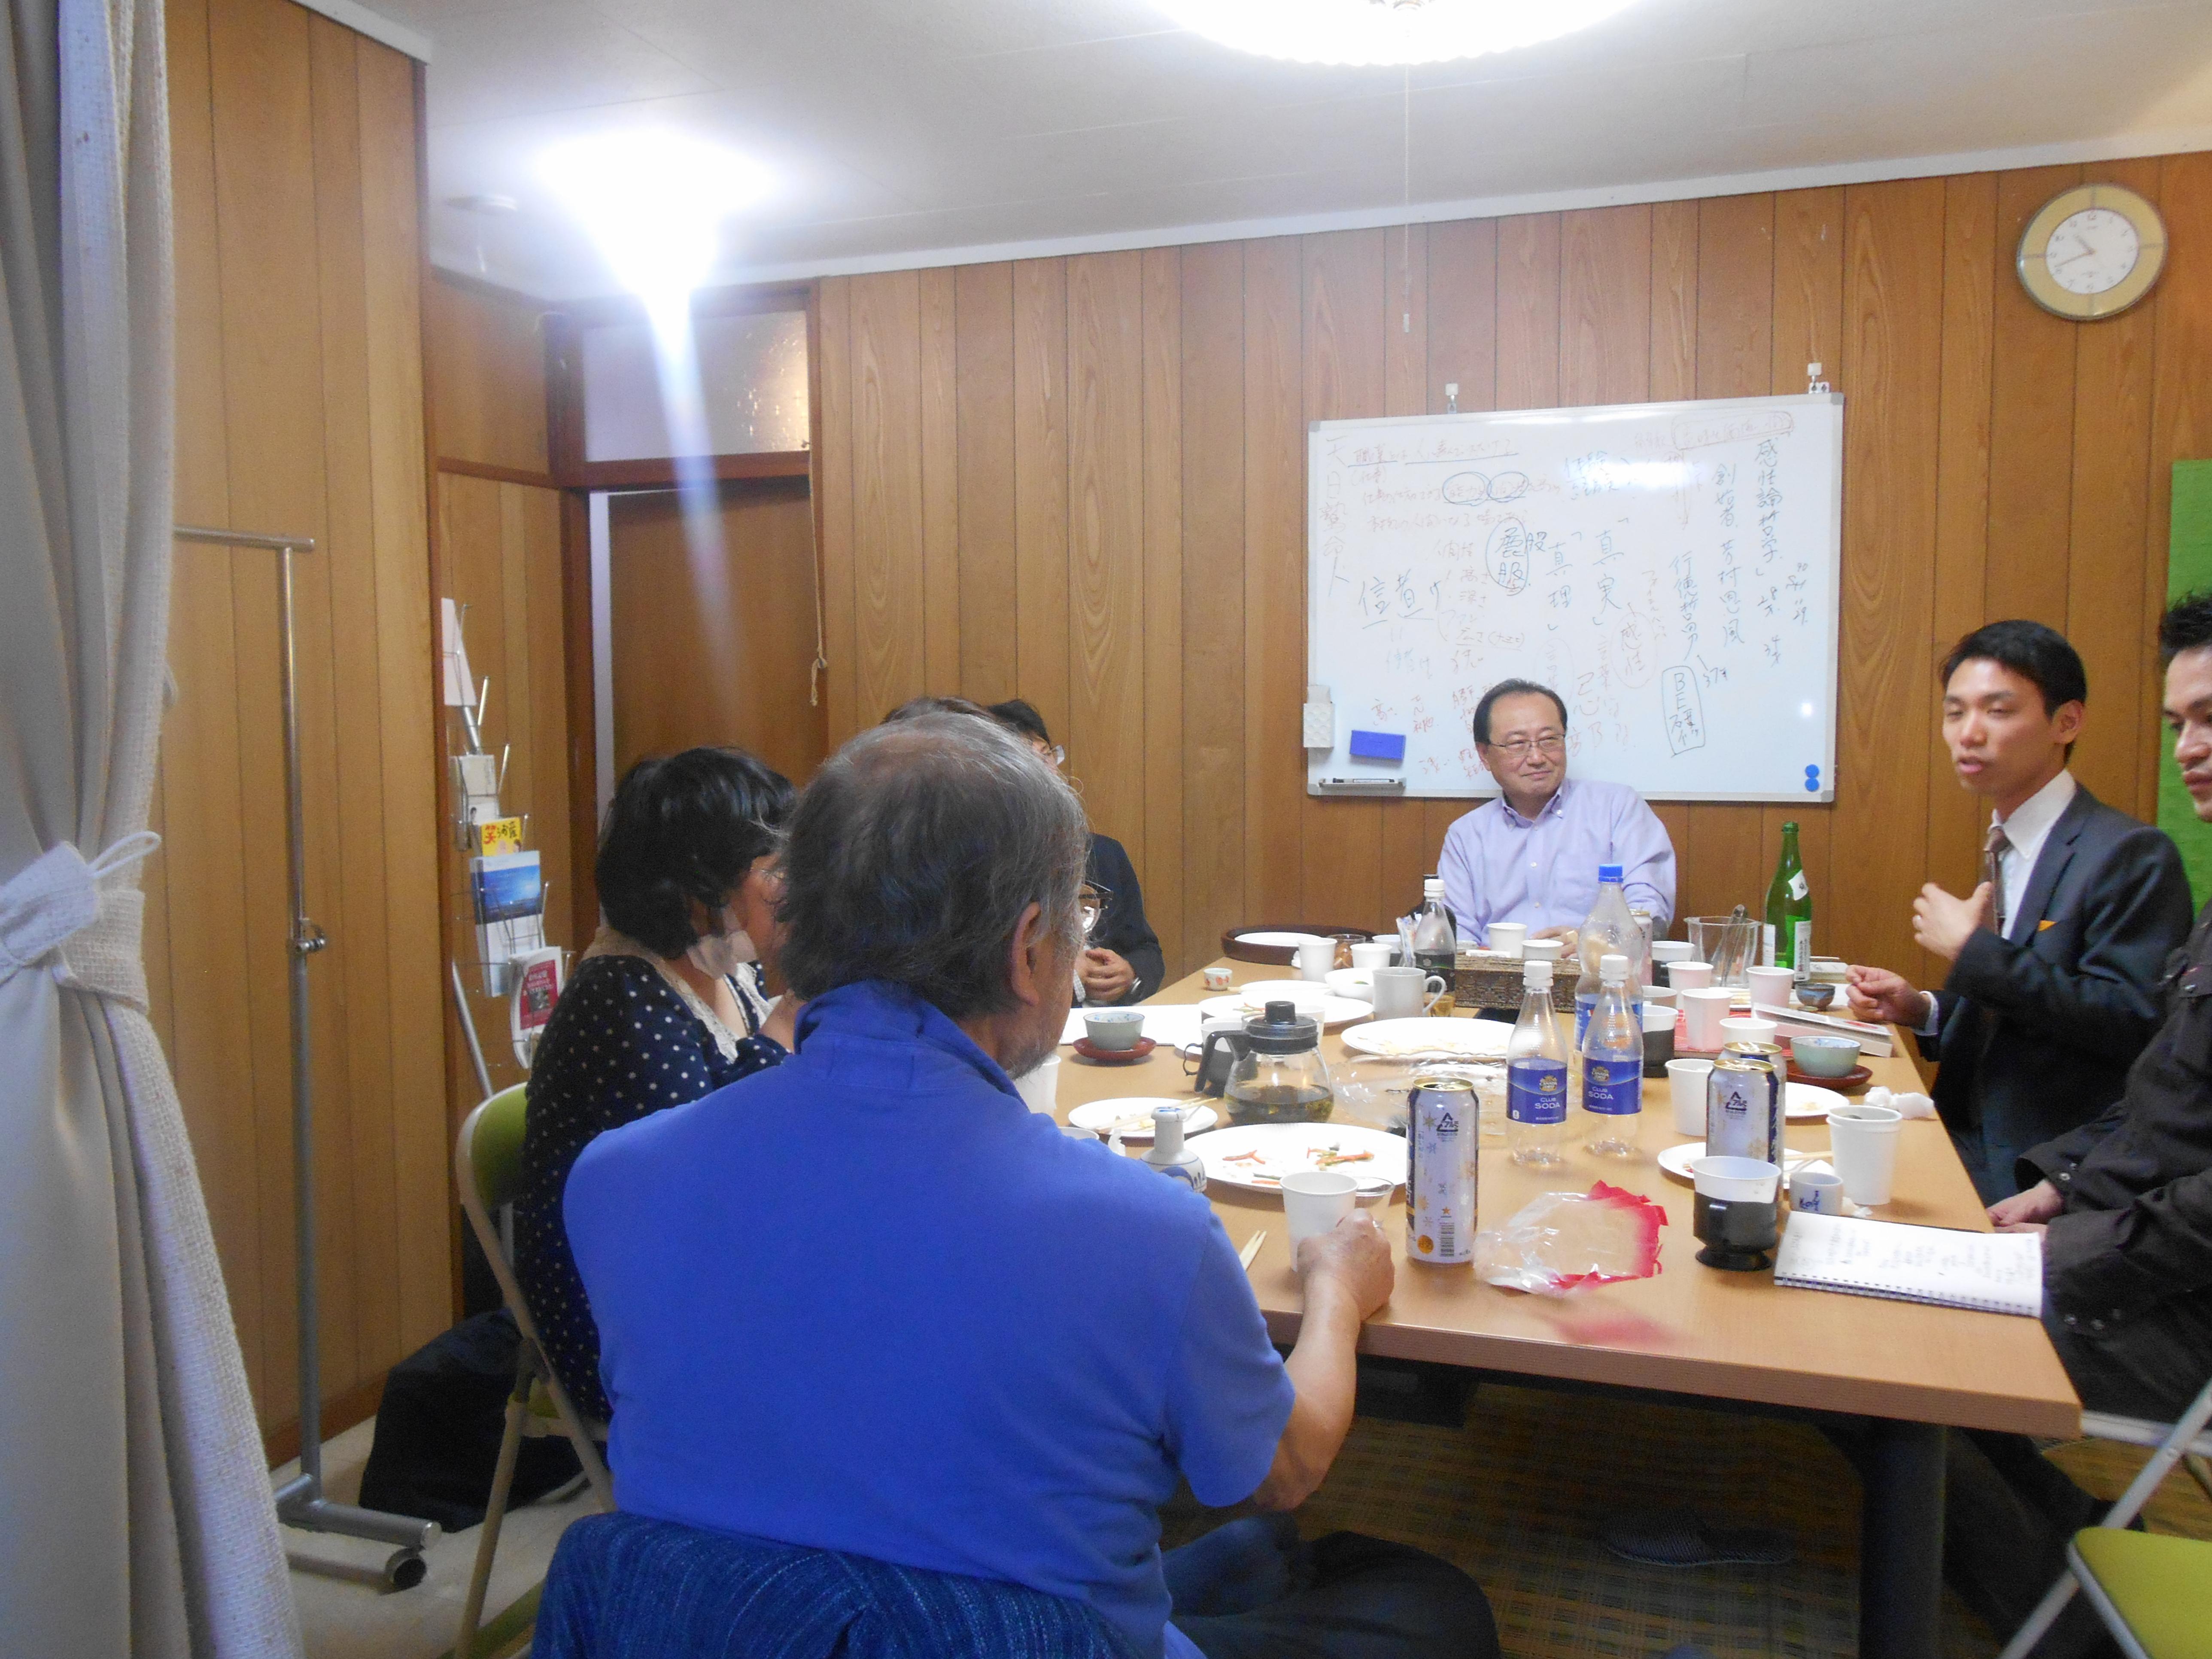 DSCN5862 - 平成30年度 東京思風塾 4月7日(土)「時代が問題をつくり、問題が人物をつくる」